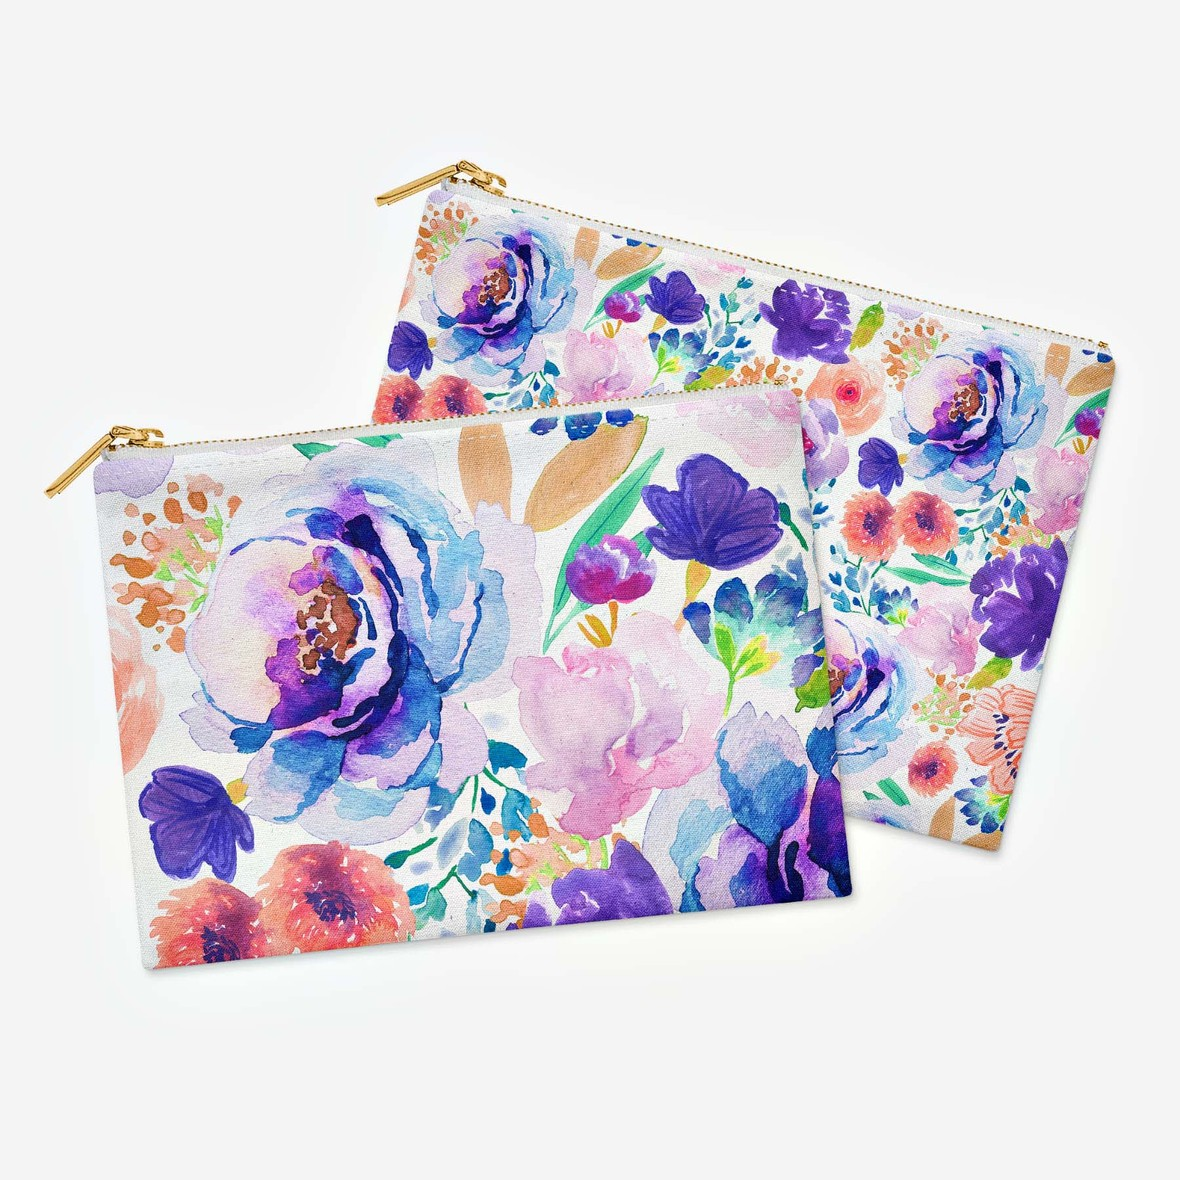 Ultra Violet pouches